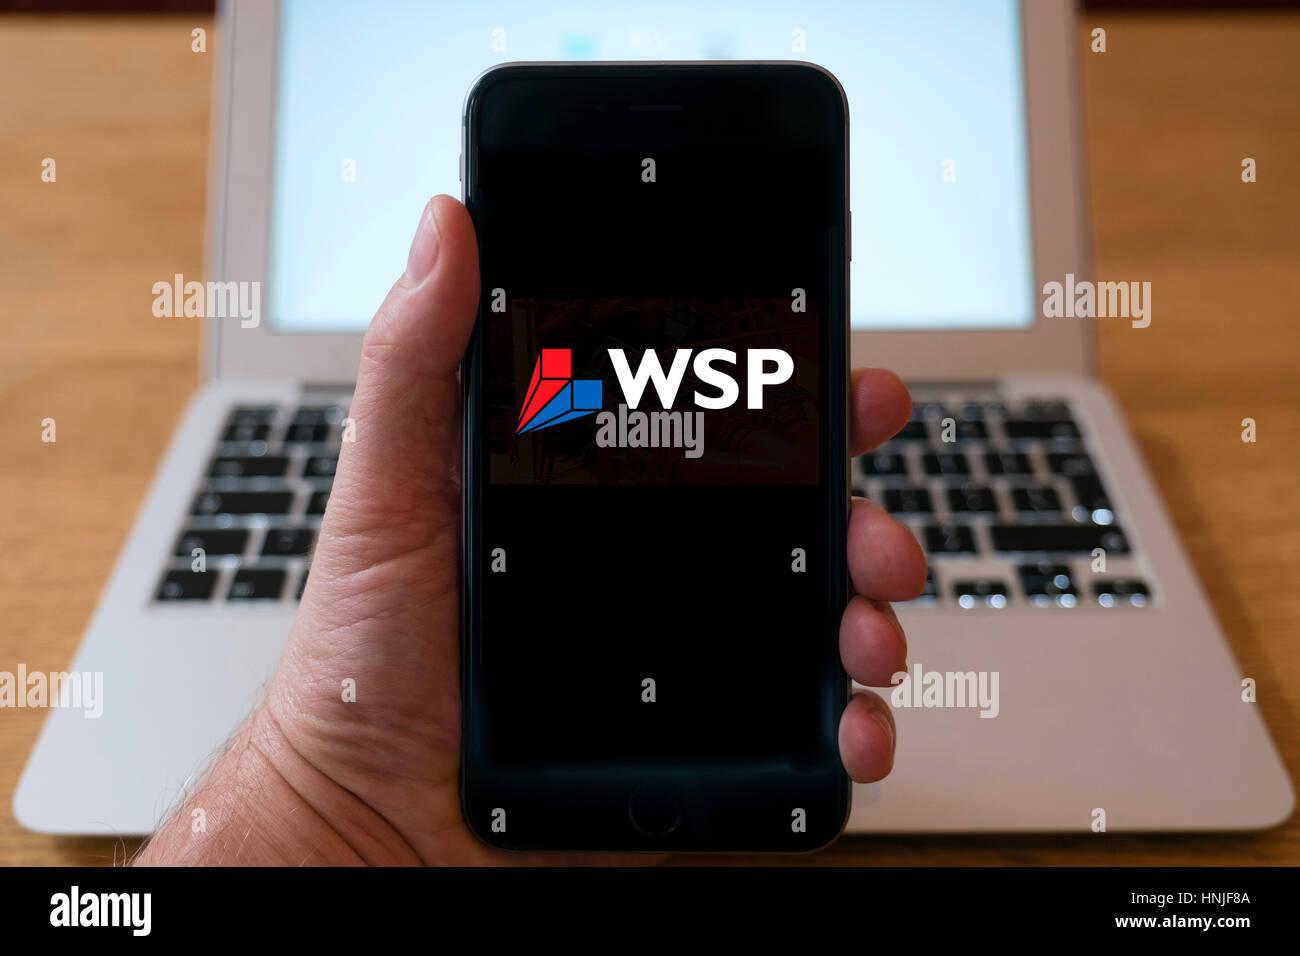 Logo of WSP international engineering consultant on smart phone screen. - Stock Image